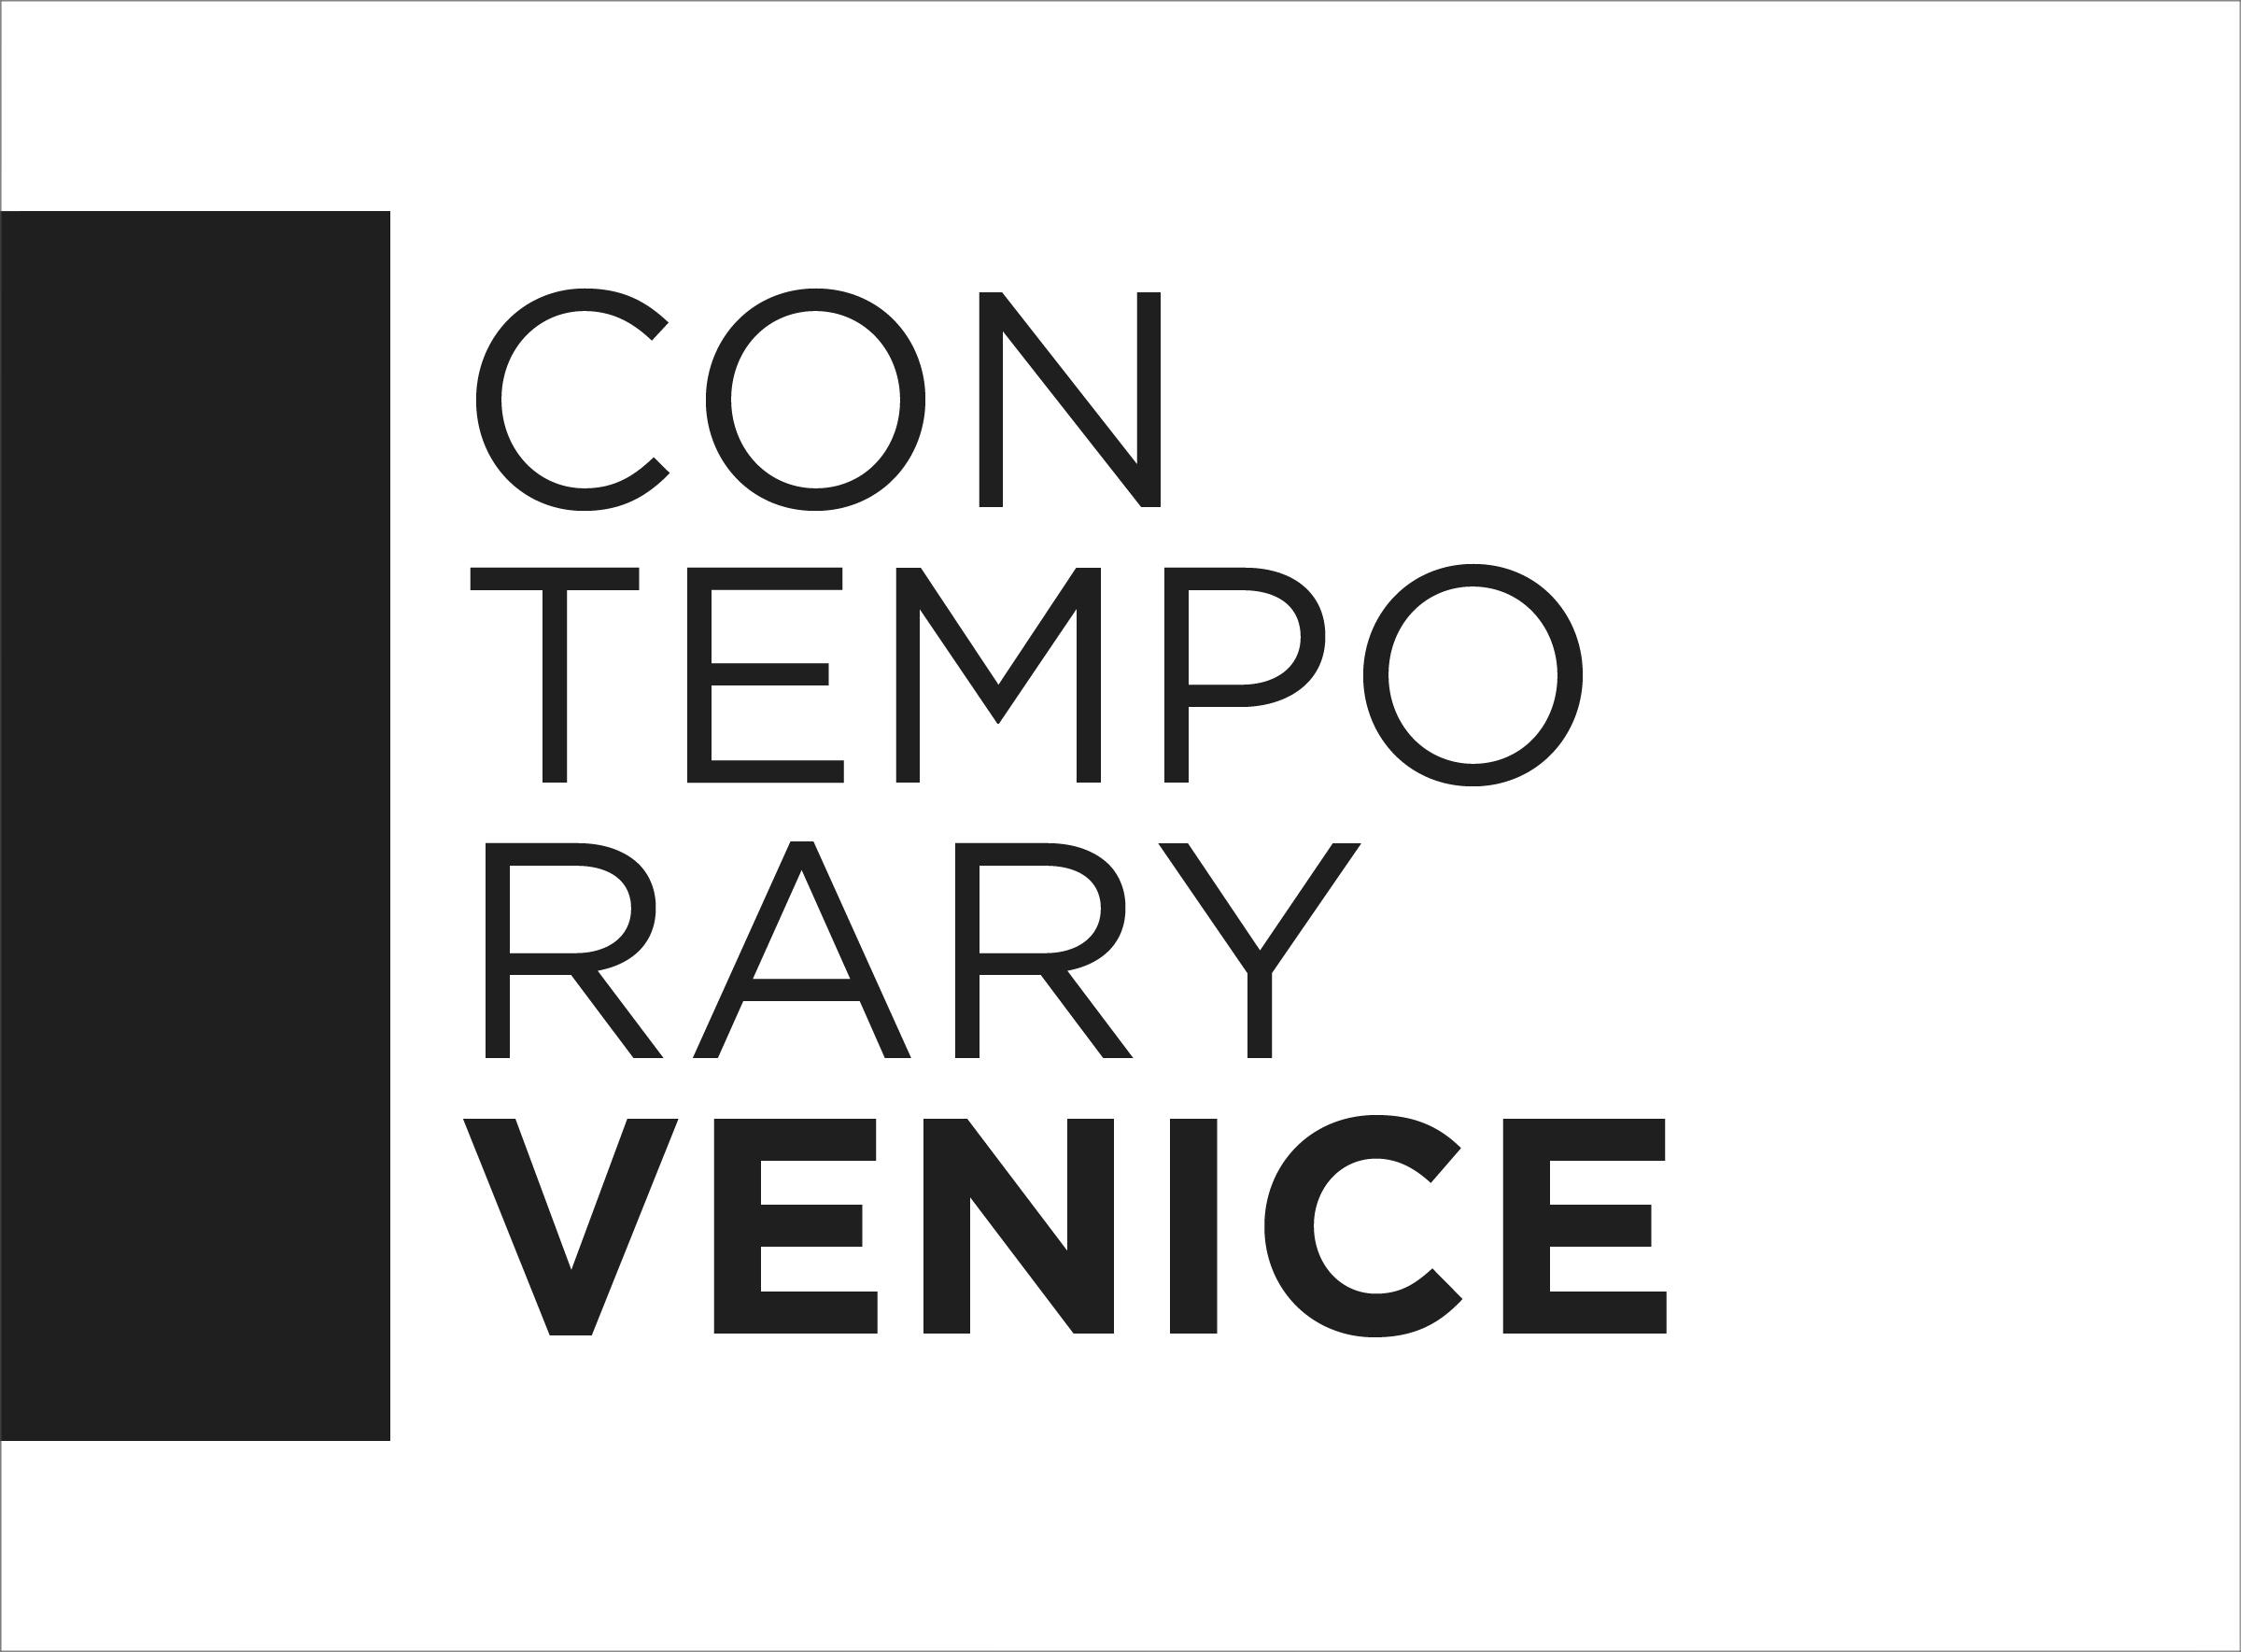 CALL FOR ARTISTS: CONTEMPORARY VENICE 2018 - THE ROOM